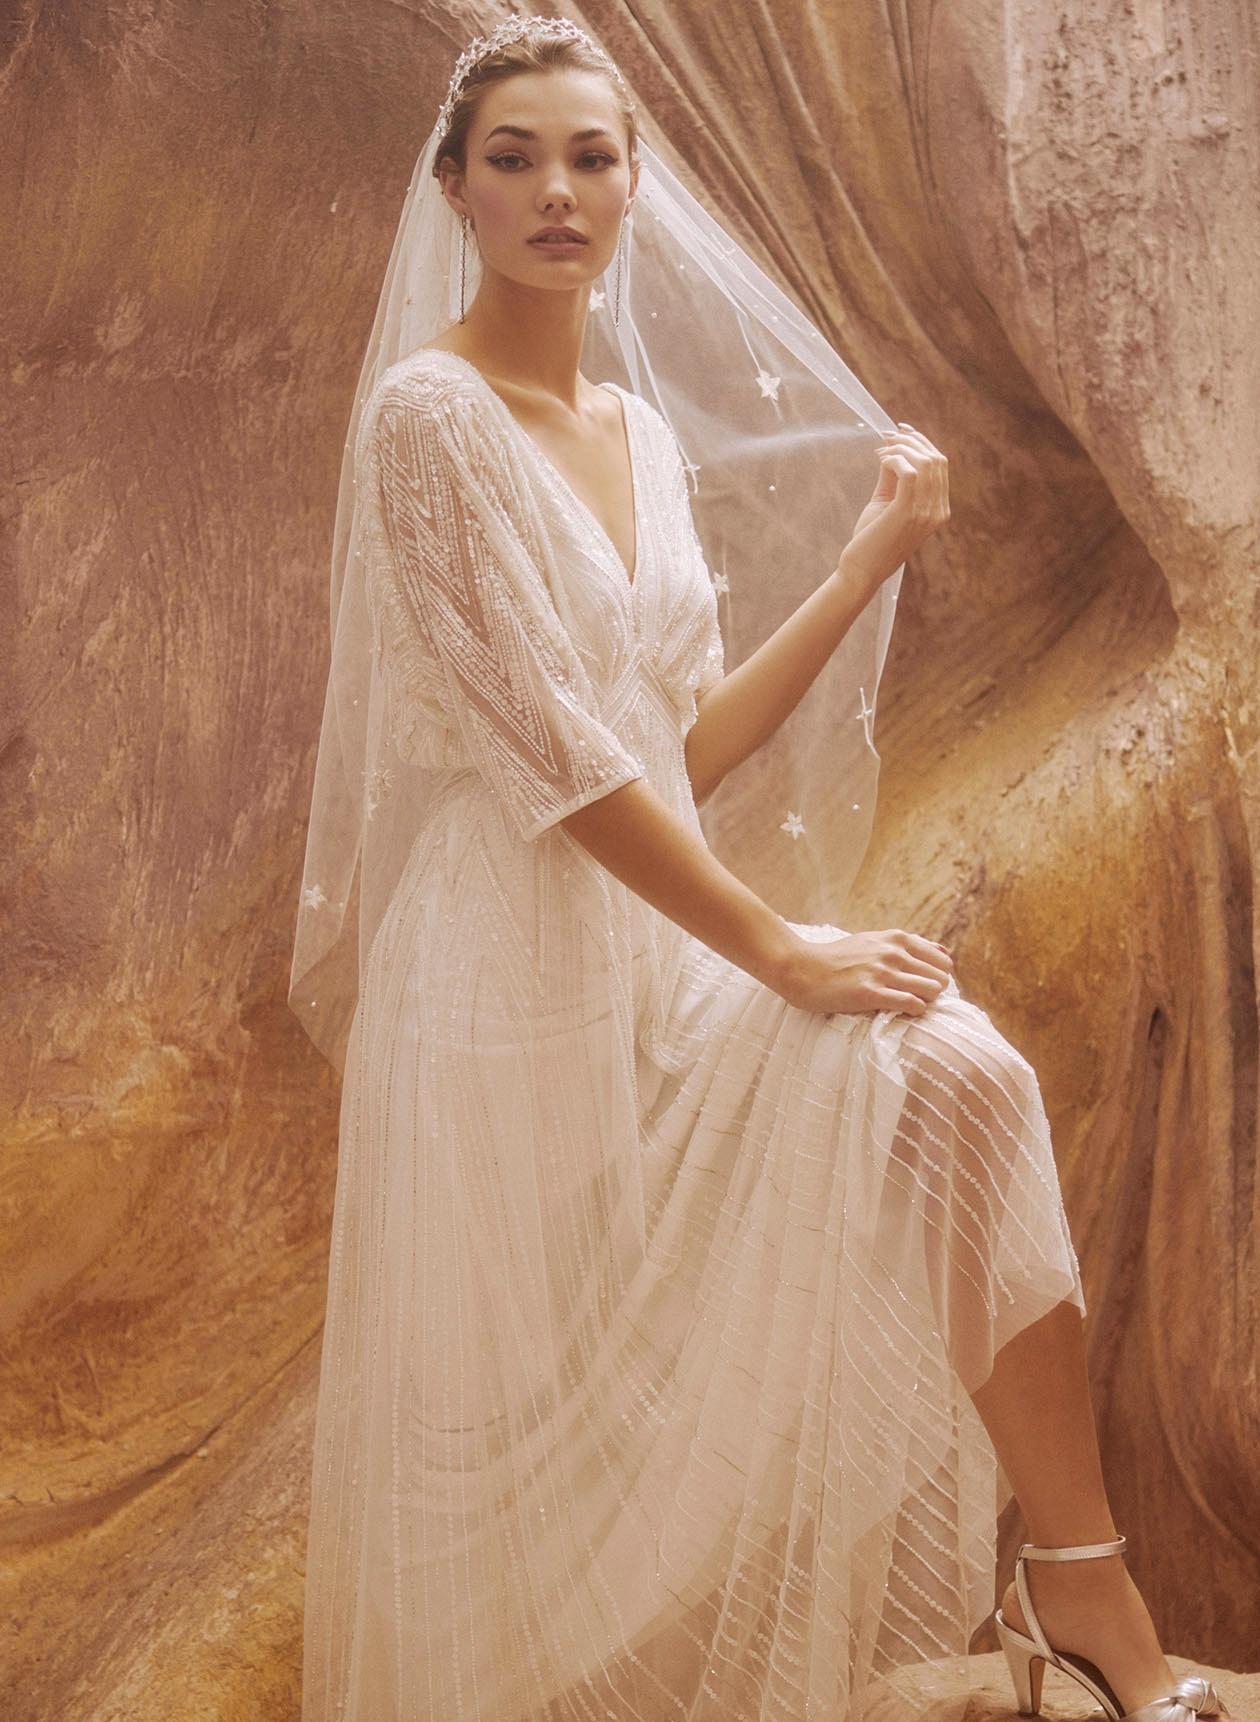 Ellesmere dress from BHLDN